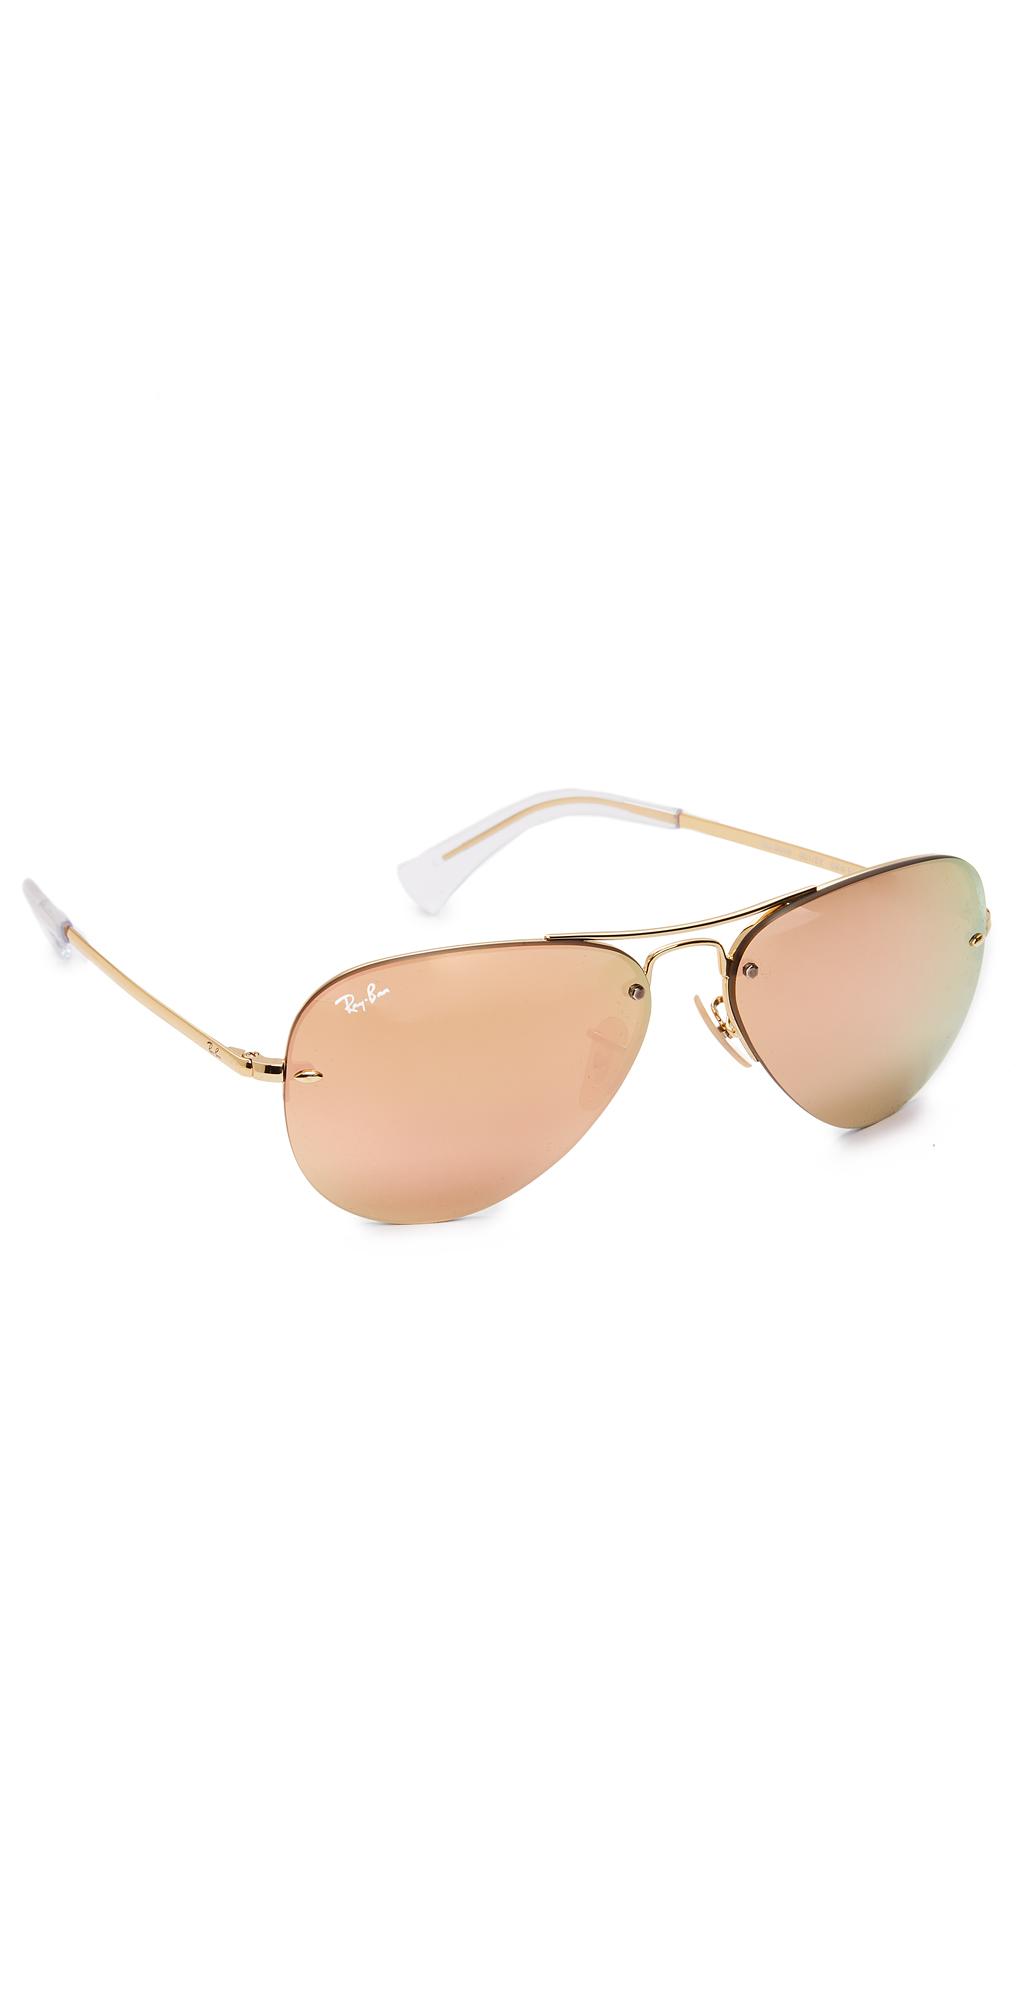 Rimless Aviator Sunglasses Ray-Ban